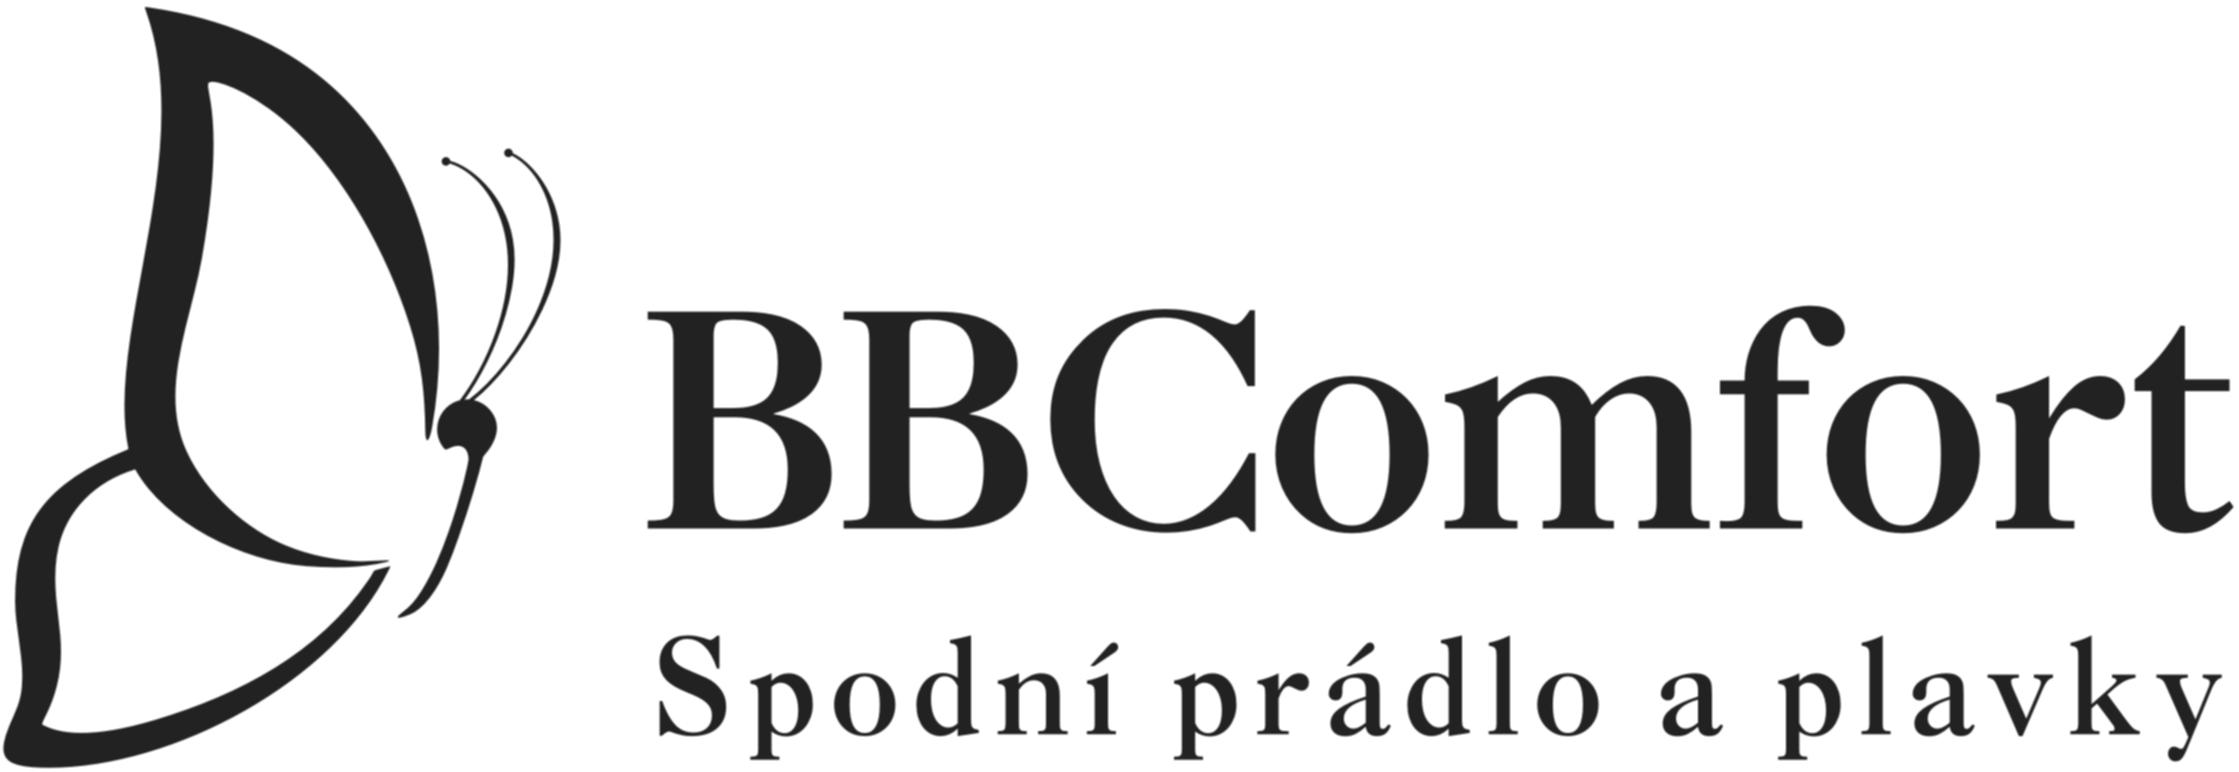 BBComfort